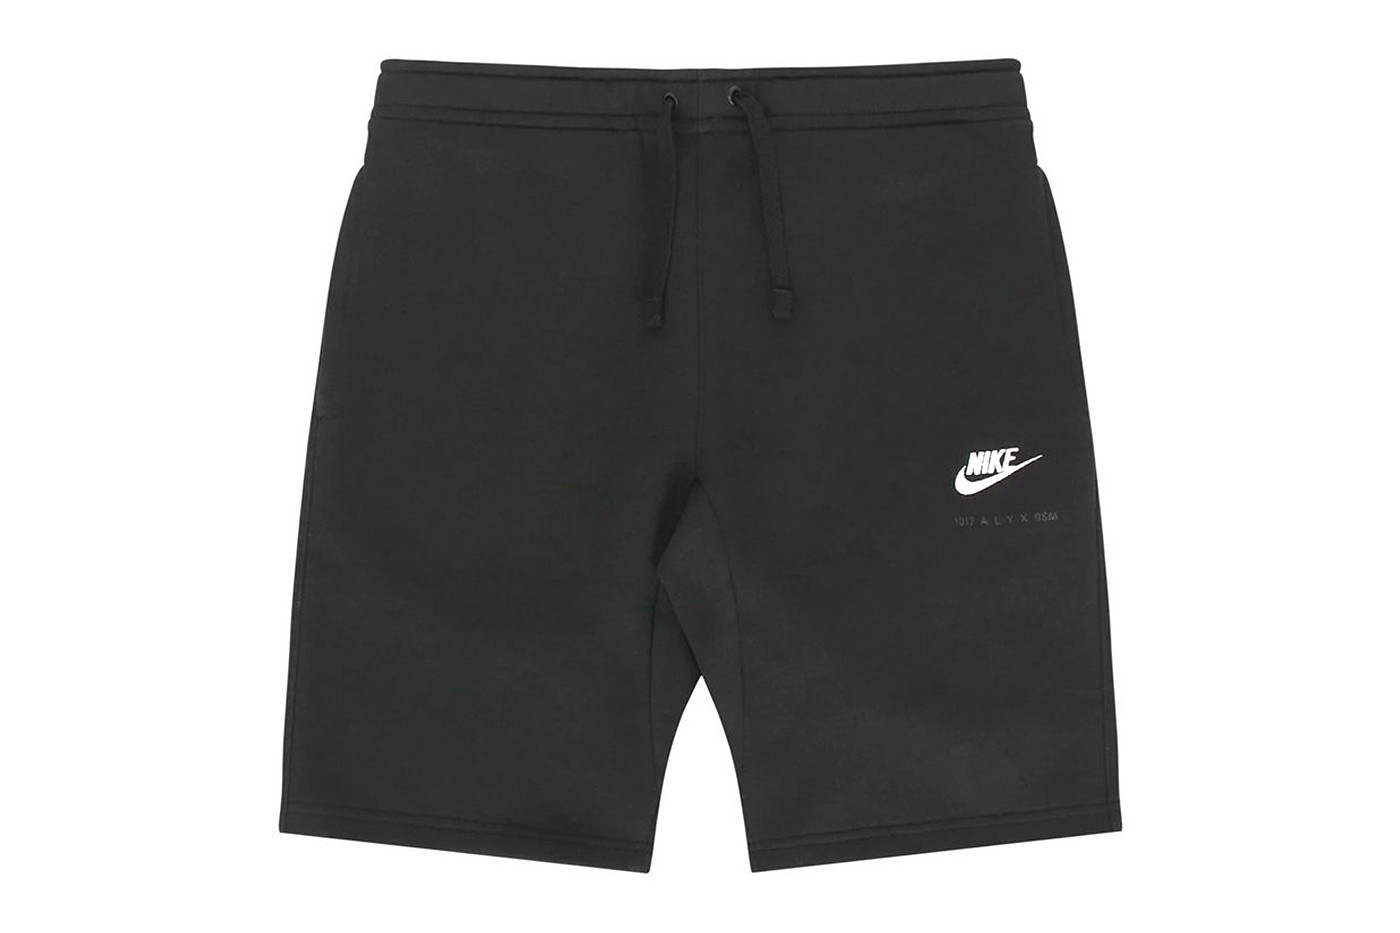 Nike x 1017 ALYX 9SM shorts